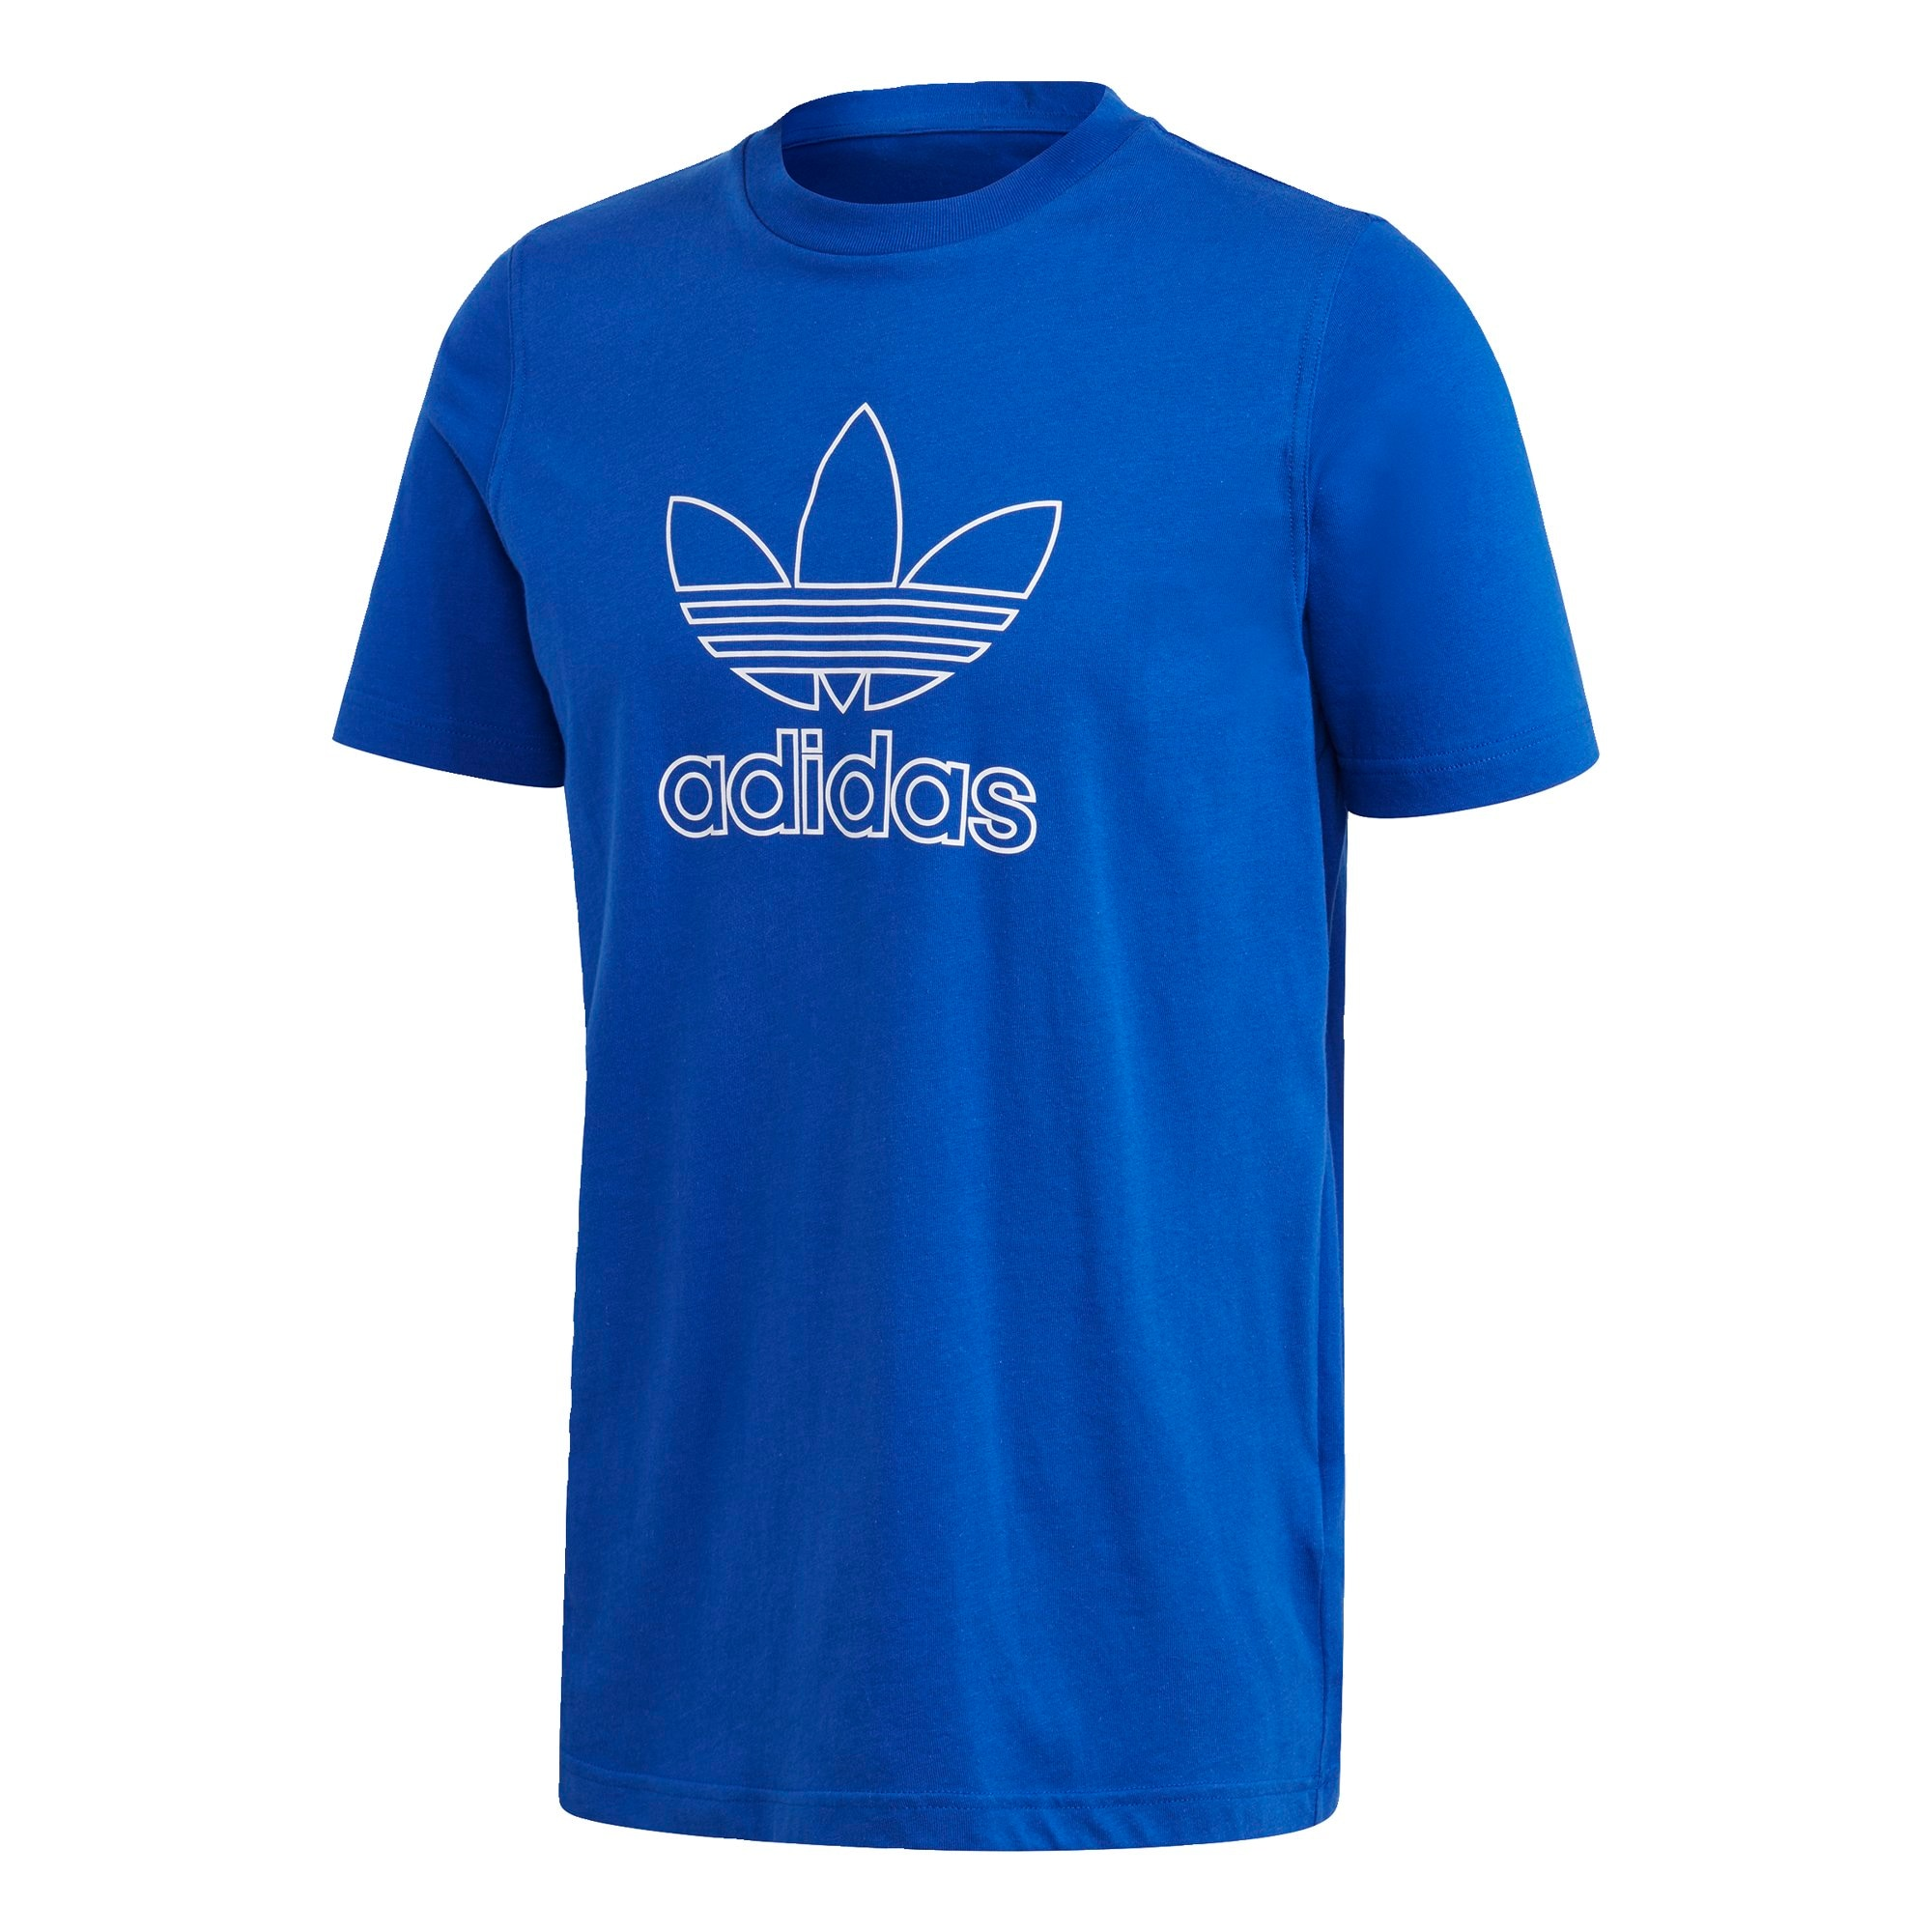 adidas originals - T-Shirt 'Trefoil'